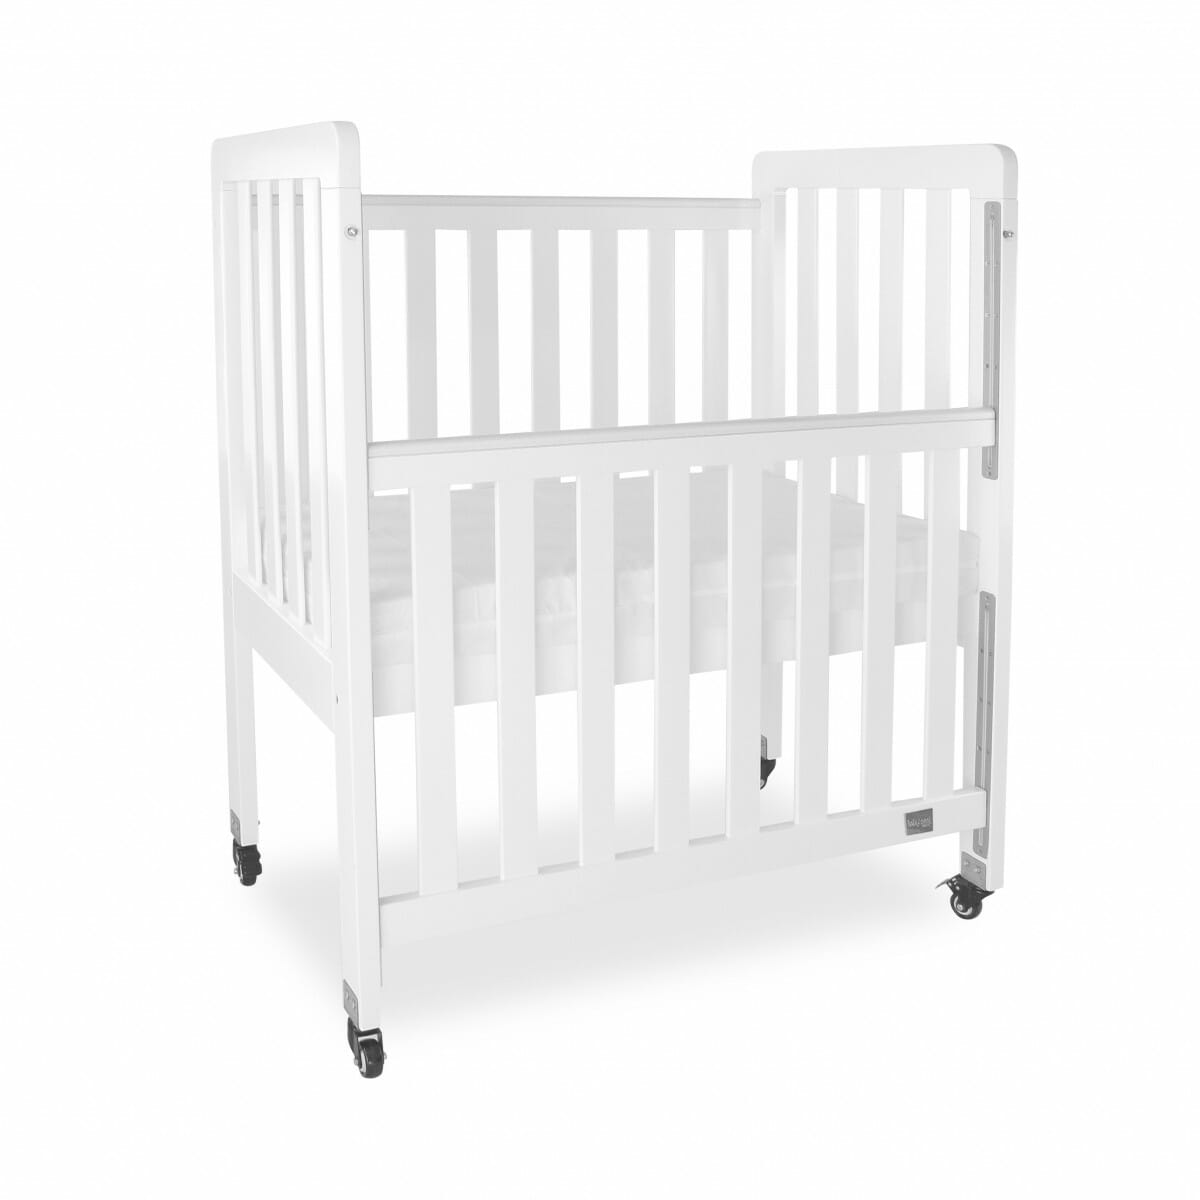 babyhood Mini Ergonomic Cot - White Angle dropside down